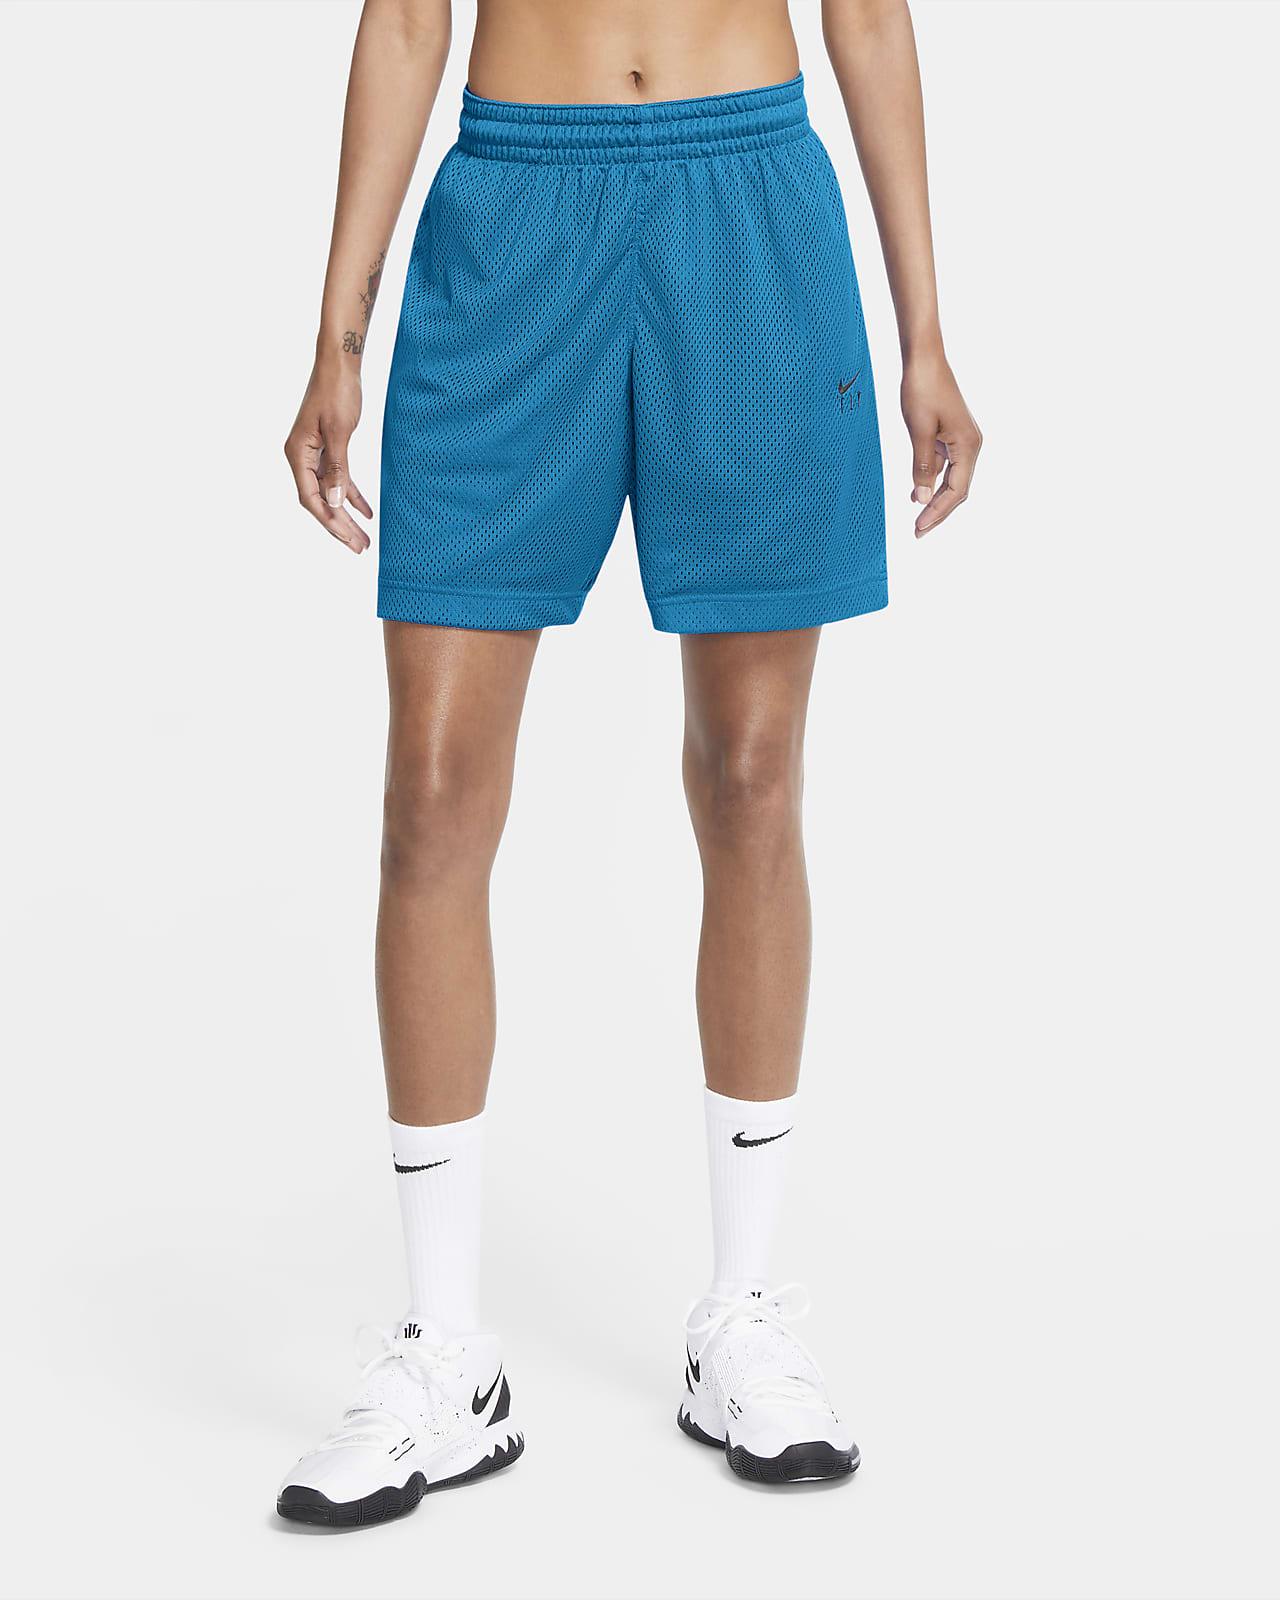 Short de basketball Nike Swoosh Fly pour Femme